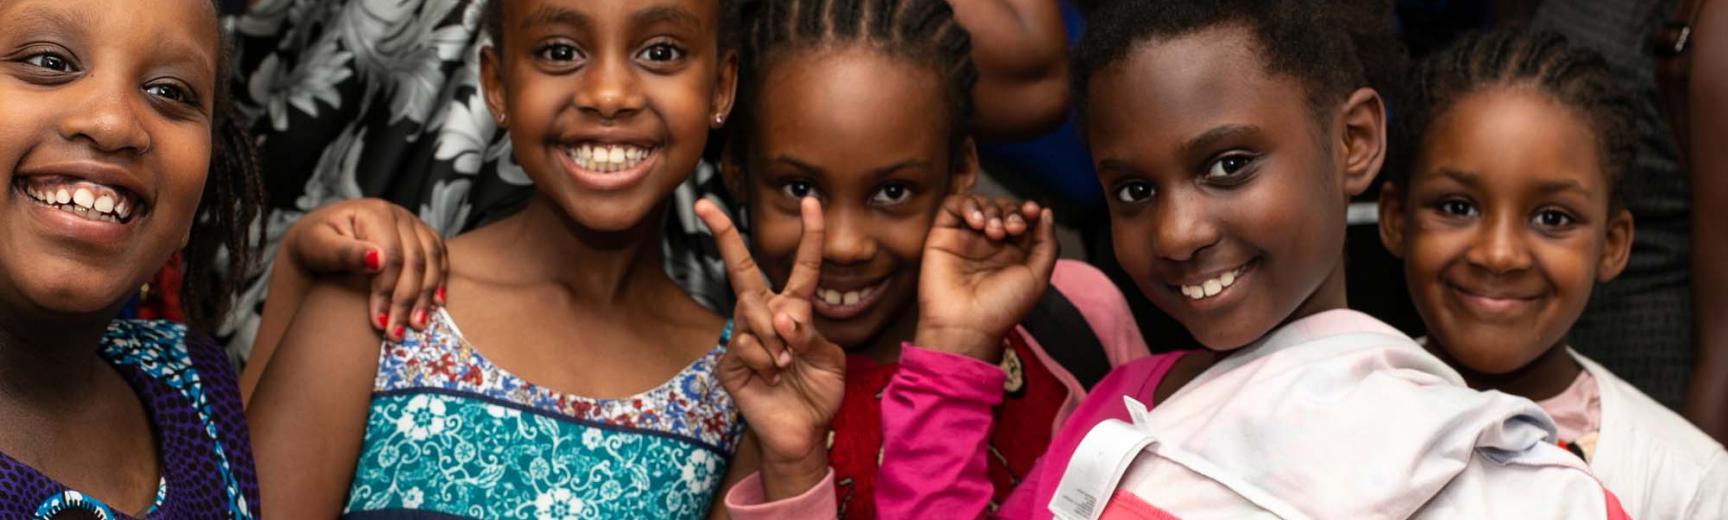 Rwanda community launch